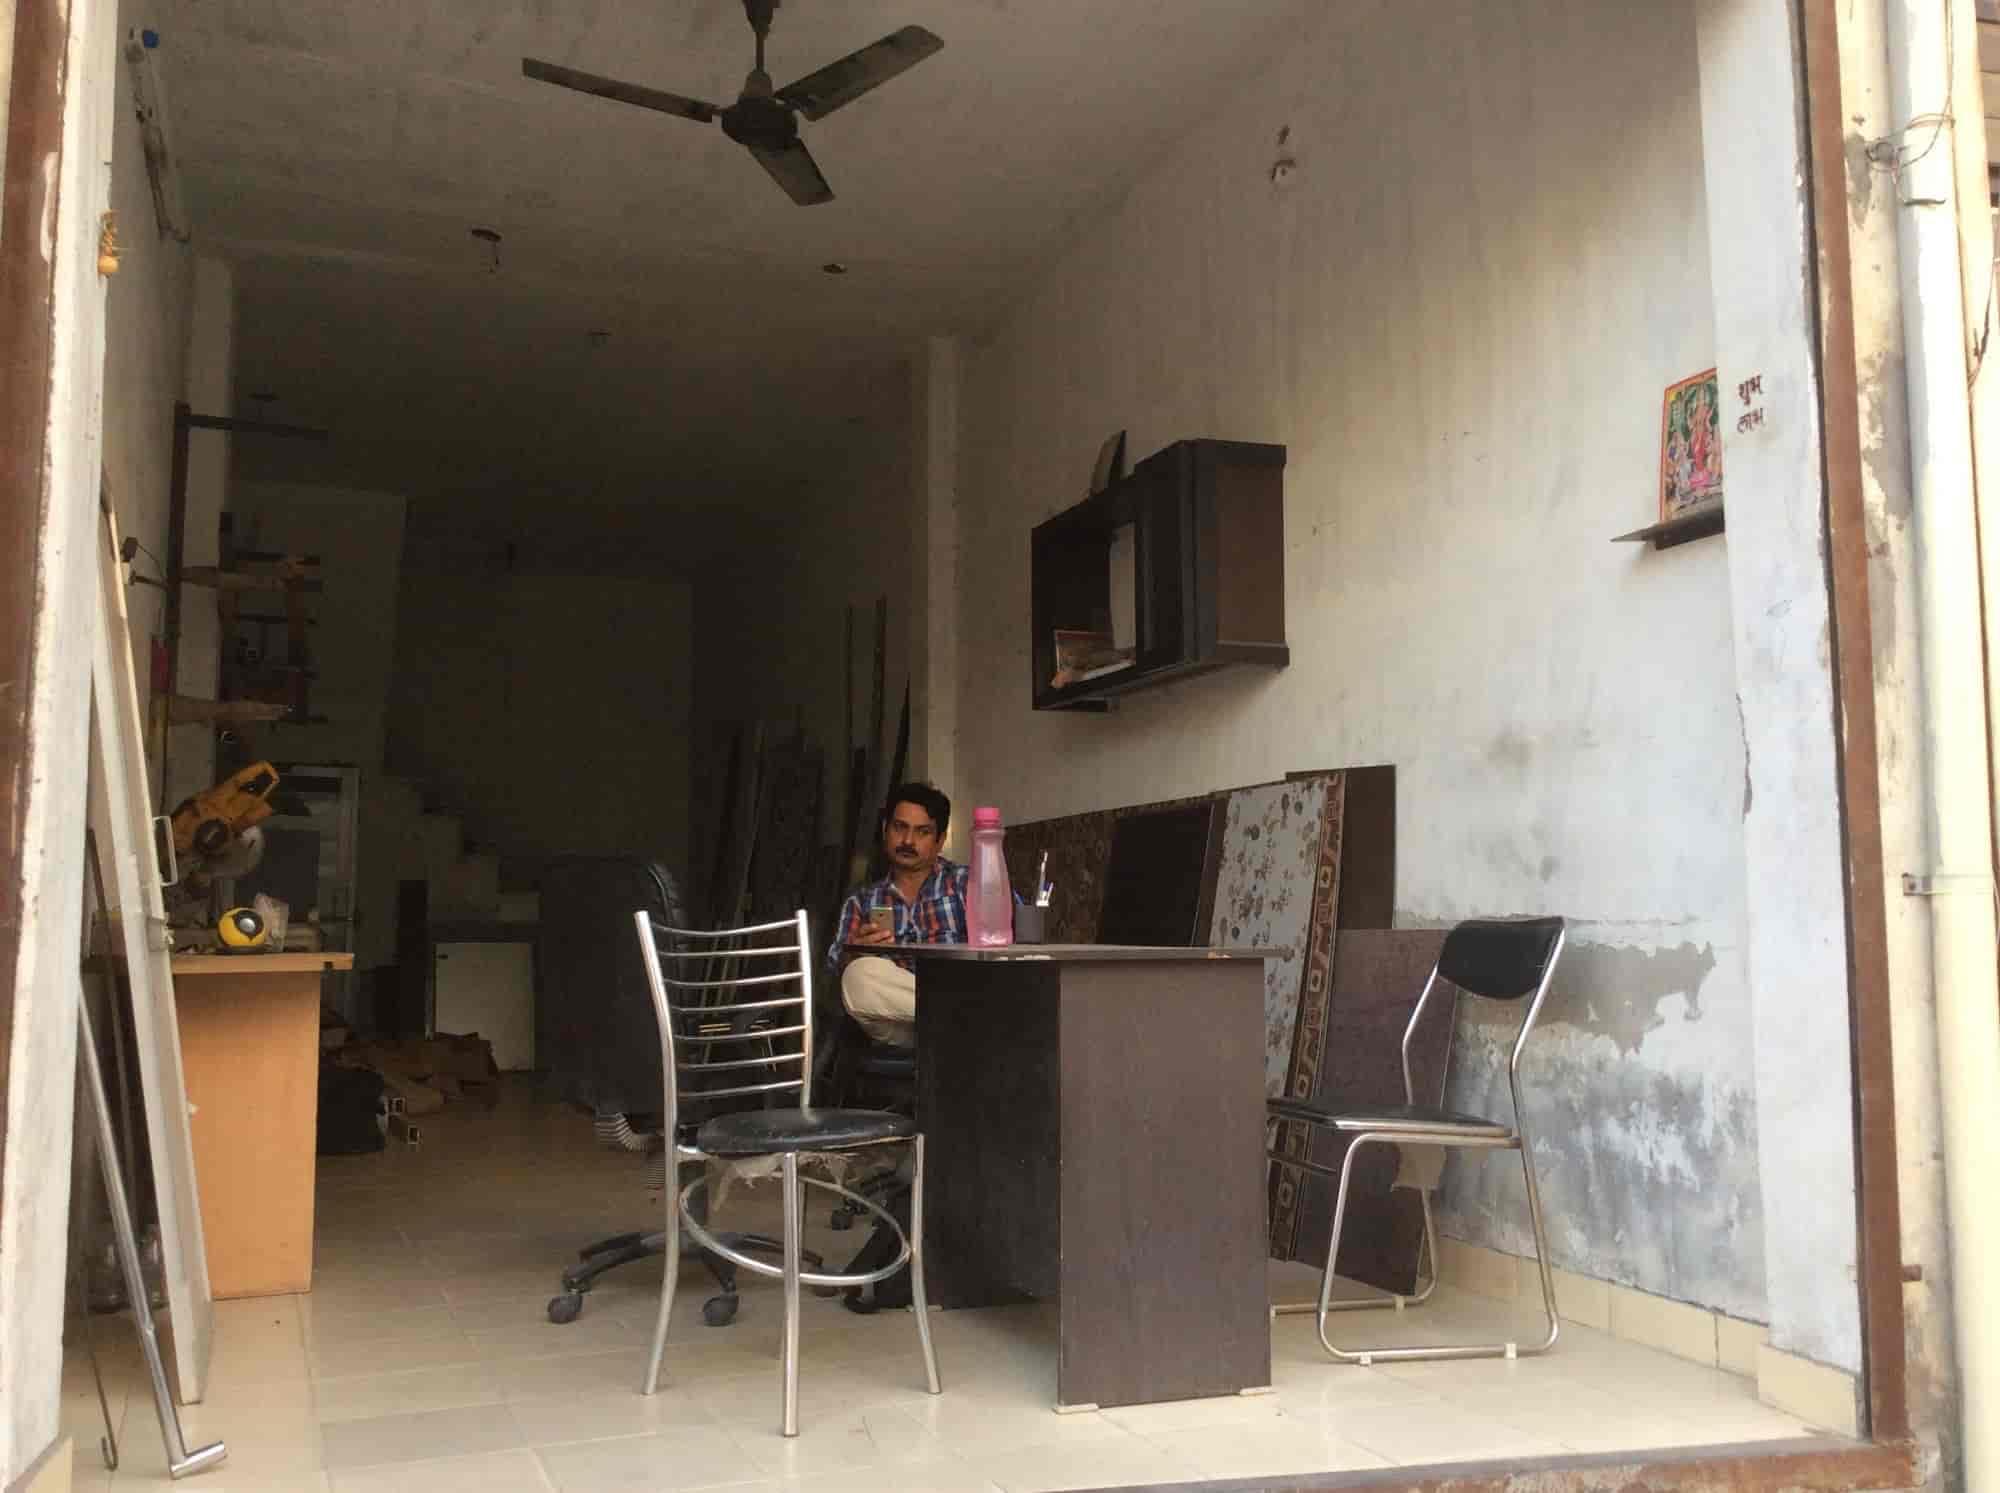 Aum Deco Studio Reviews, Chander Nagar, Ludhiana - 1 Ratings - Justdial